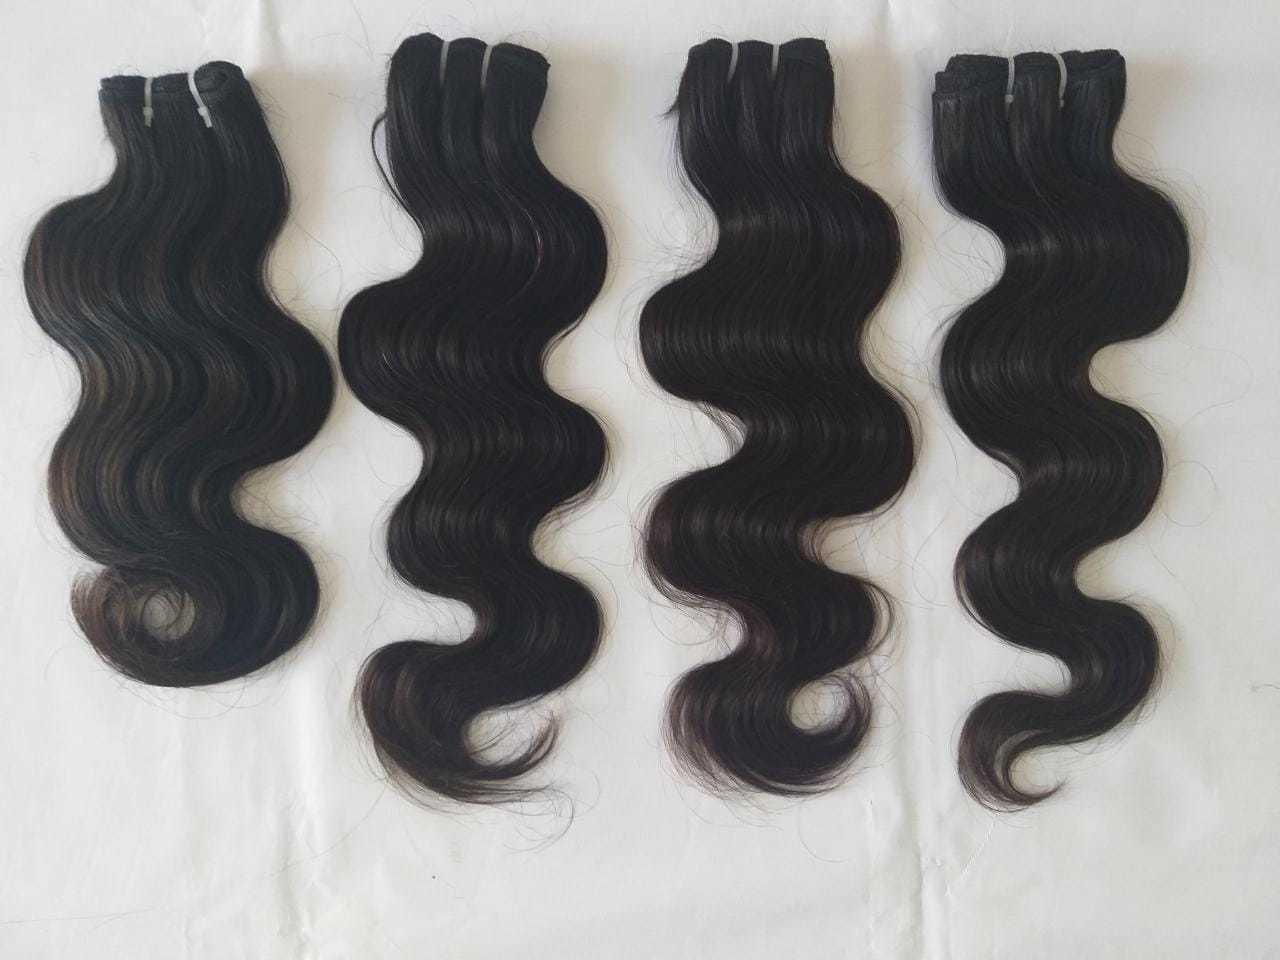 100% virgin human hair top quality Loose Body Wave Hair